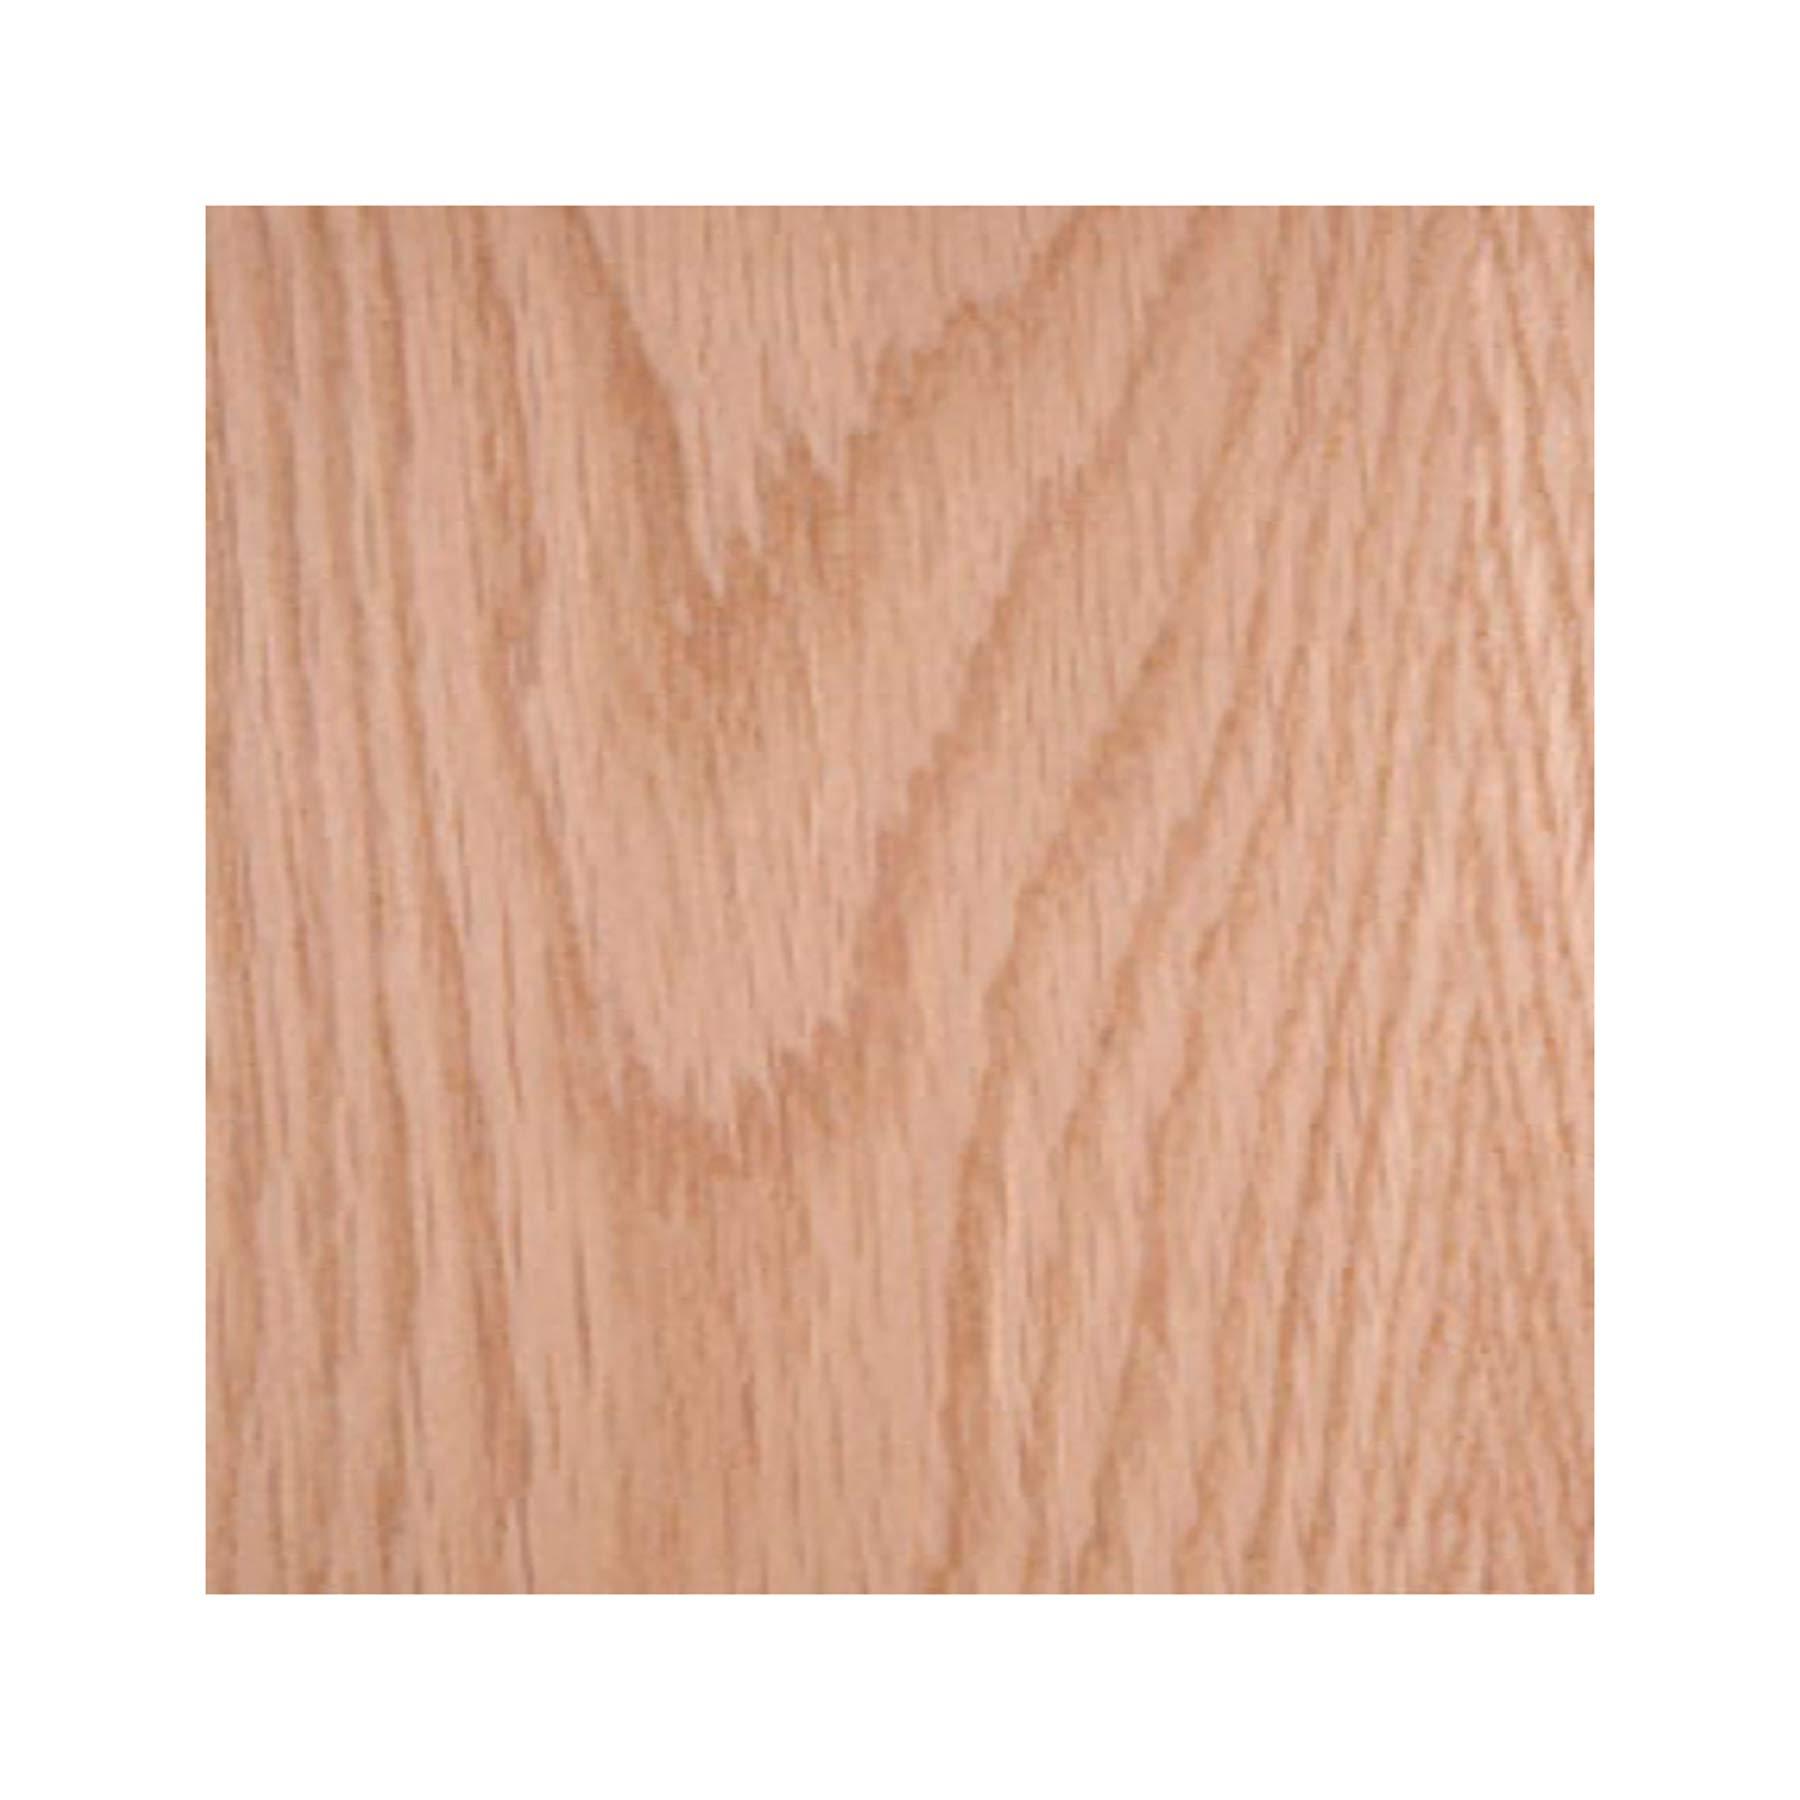 3/4 in (18mm). x 9 in x 9 in. Oak Plywood (36 Sheets) by DGwood